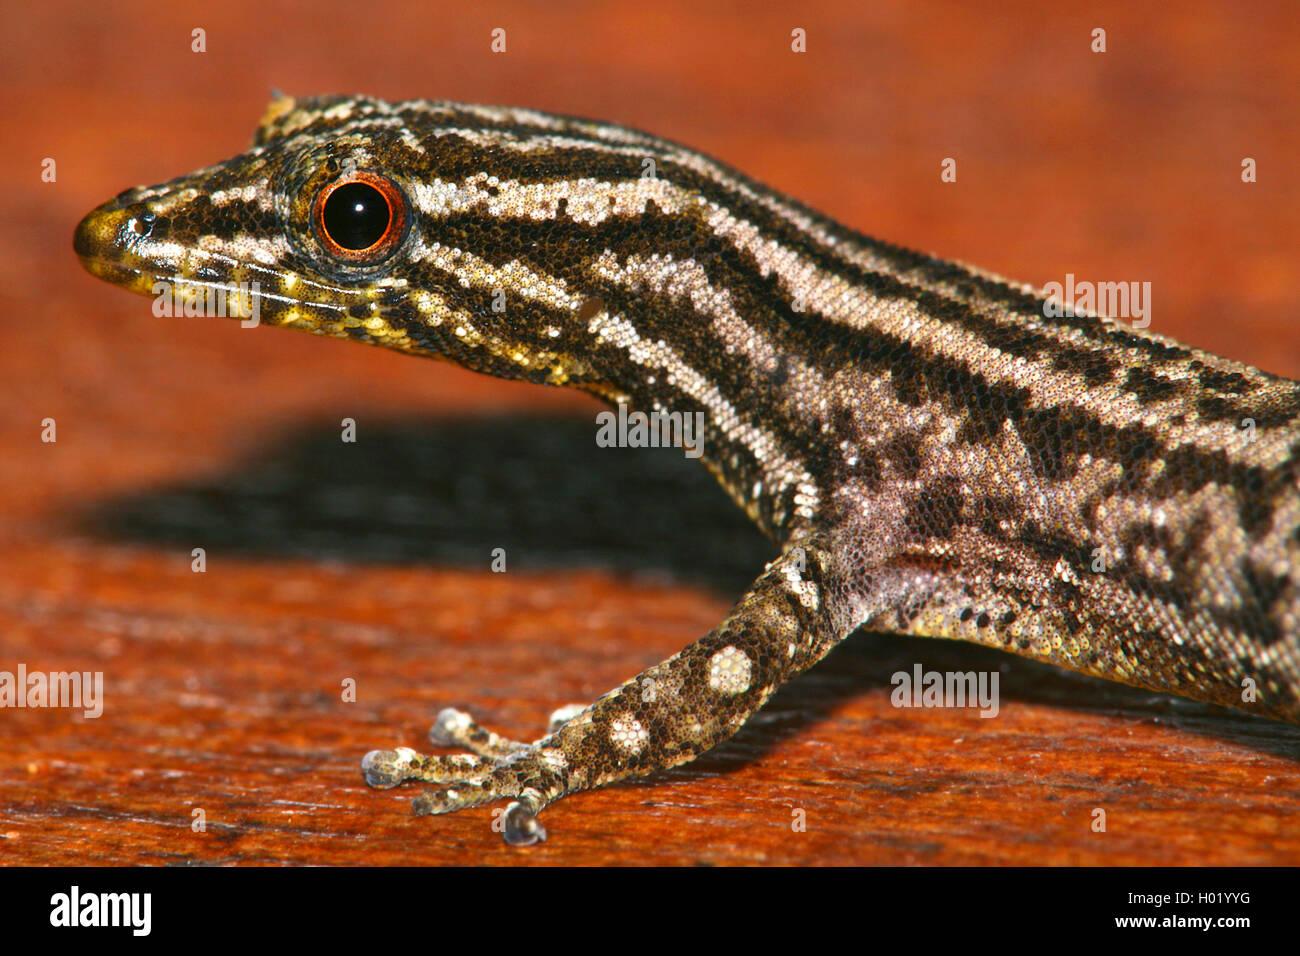 Marked-Throated pigmeos Gecko (Sphaerodactylus graptolaemus), Retrato, Costa Rica Foto de stock